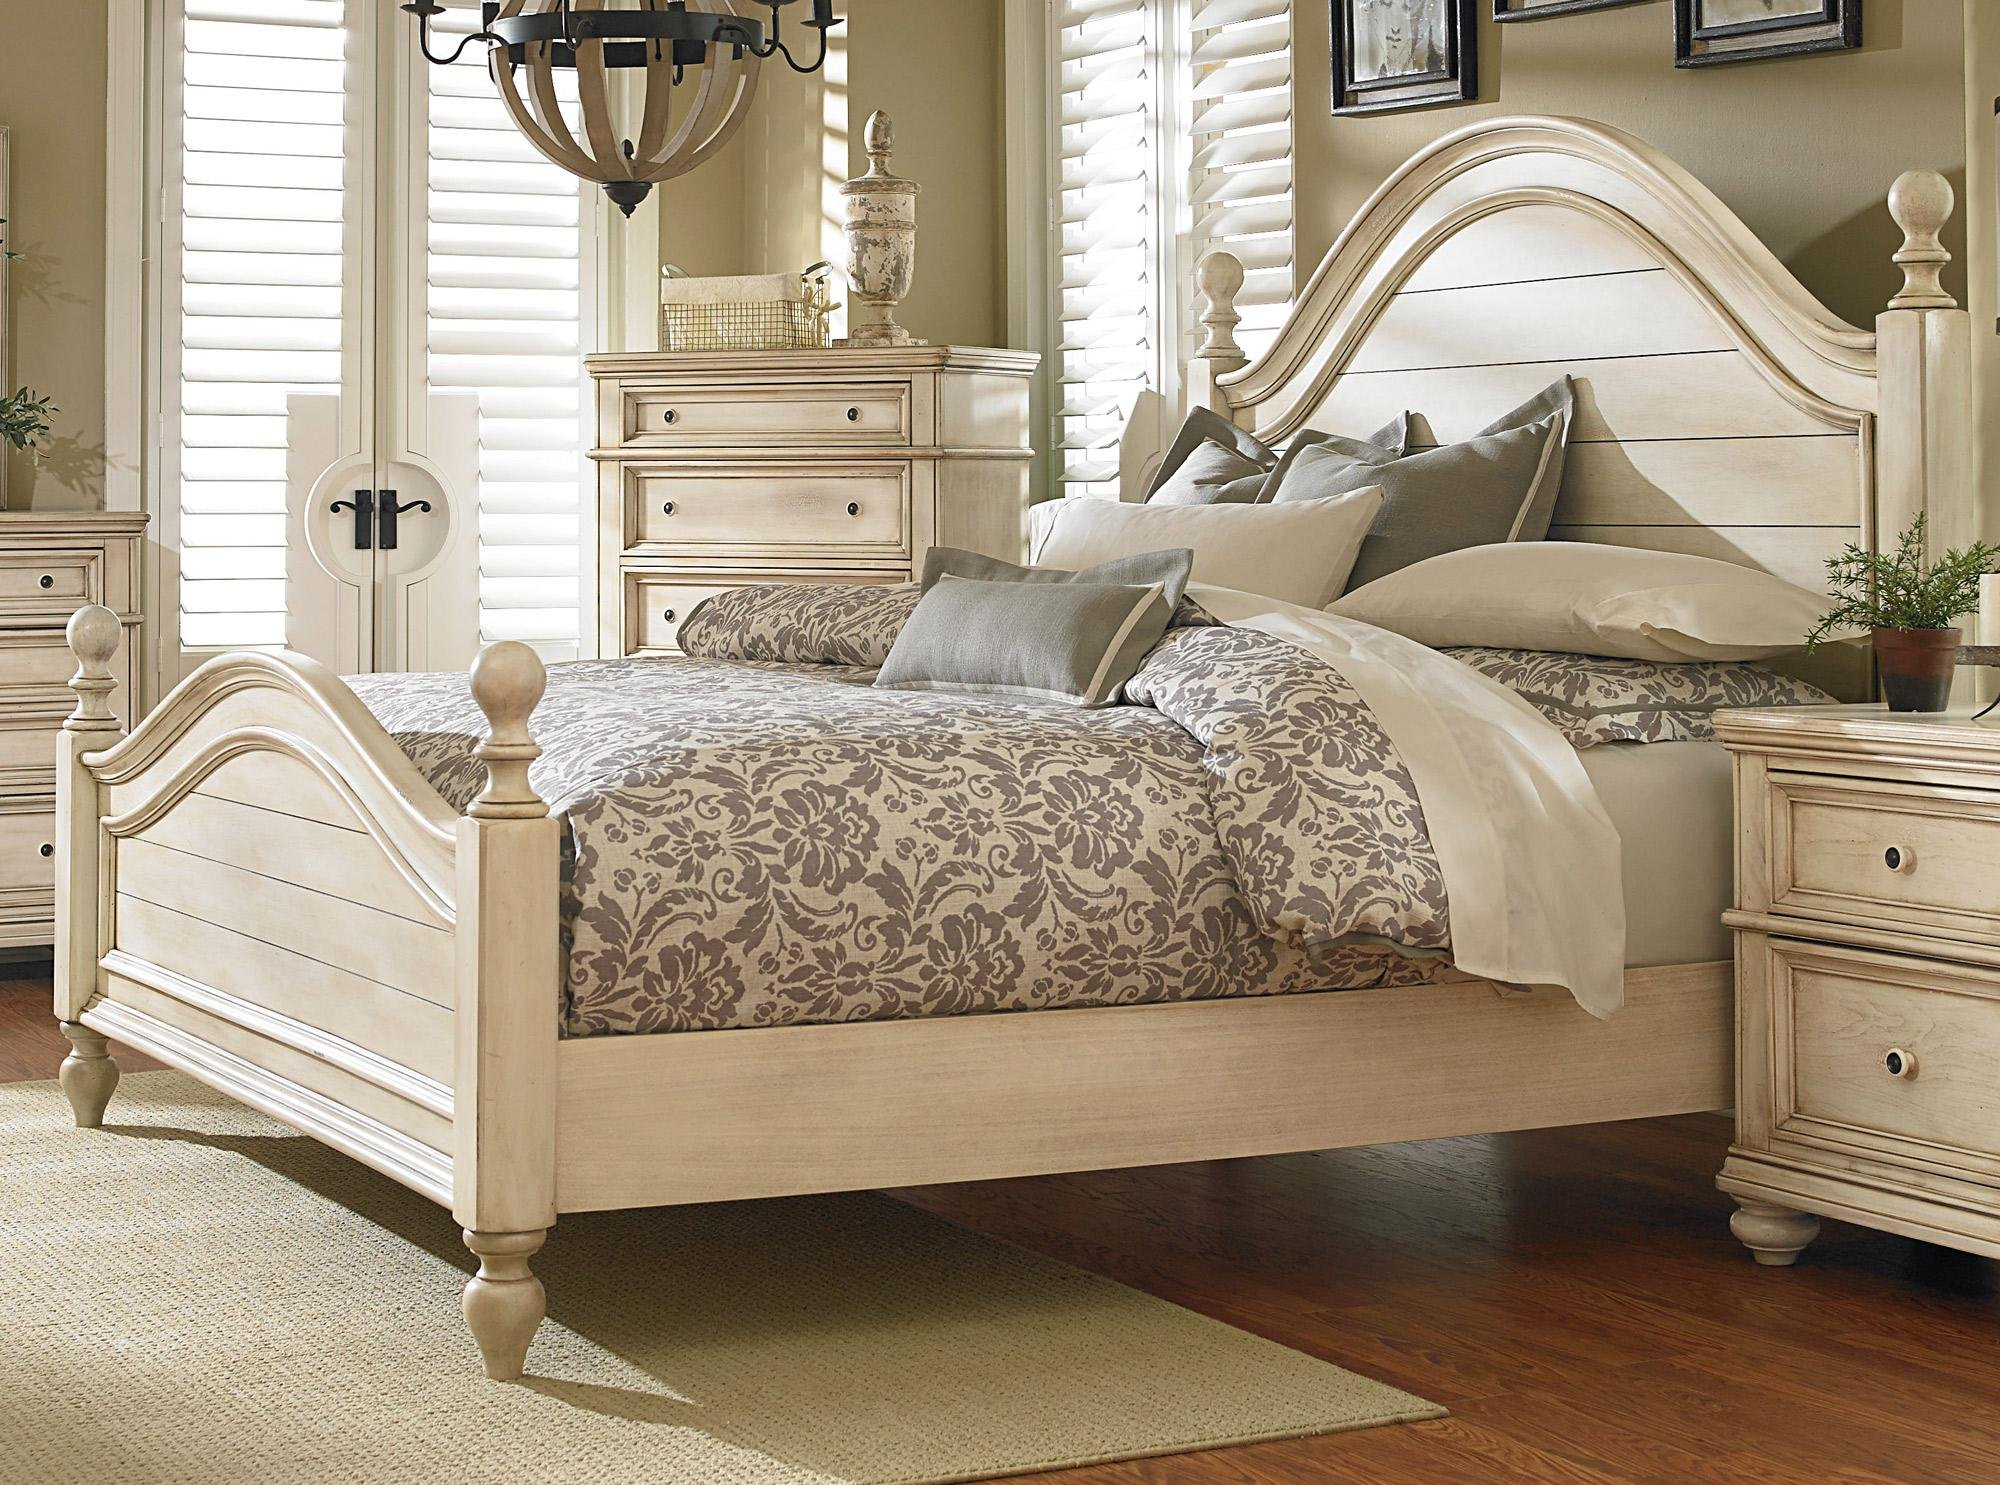 Antique White 6-Piece Queen Bedroom Set - Heritage | RC Willey ...